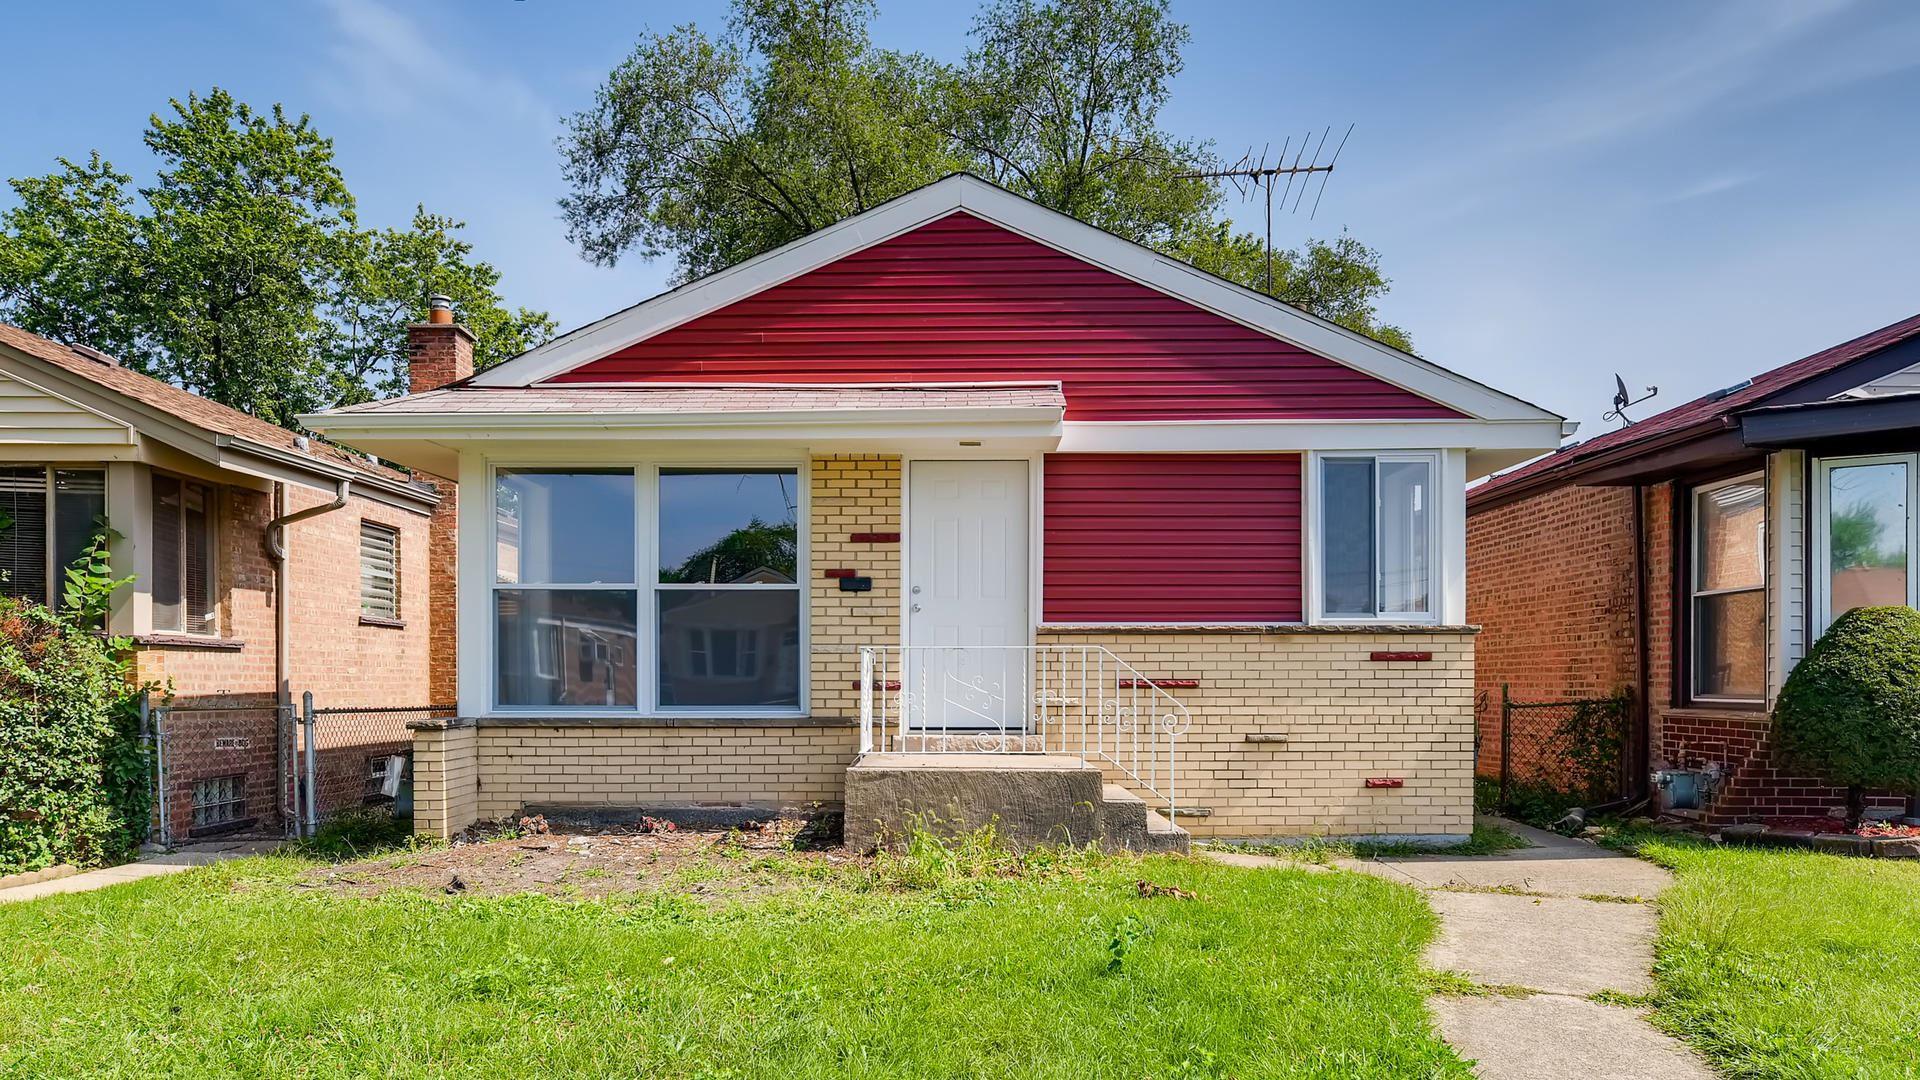 12817 S May Street, Calumet Park, IL 60827 - #: 10696036